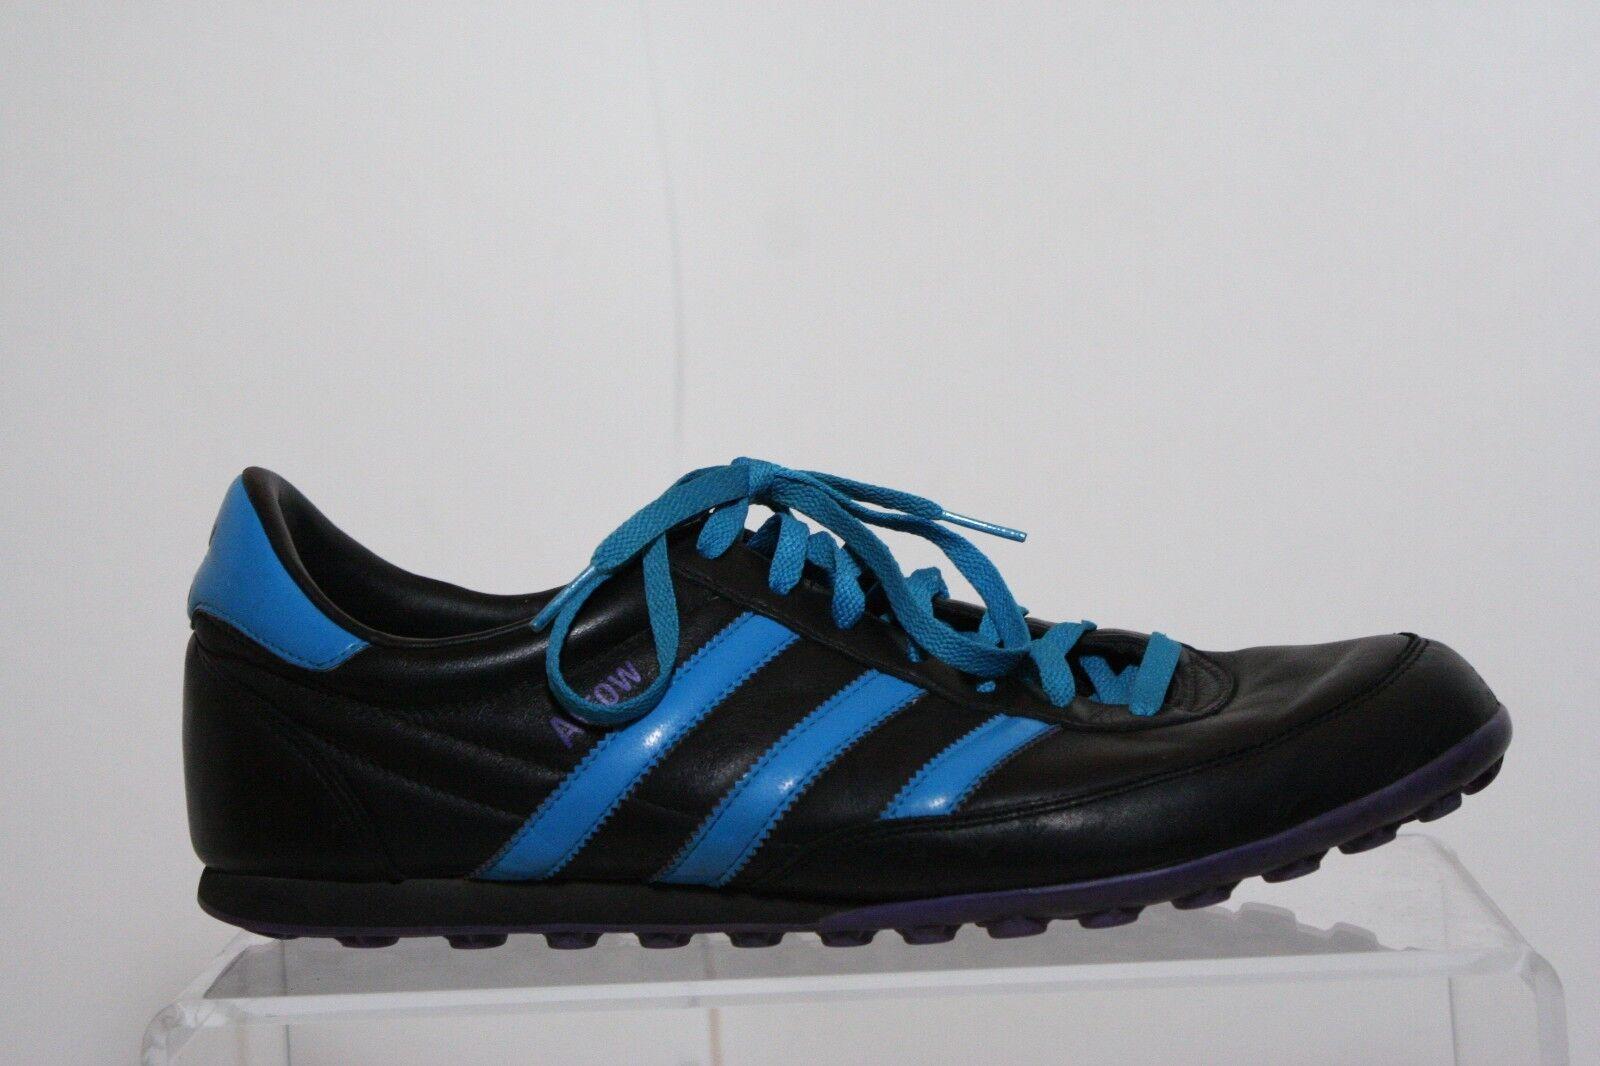 Adidas Arrow Sneaker Retro Waffle Runner 06' Sneaker Arrow Athletic Multi Black Teal Men 12 a220a4